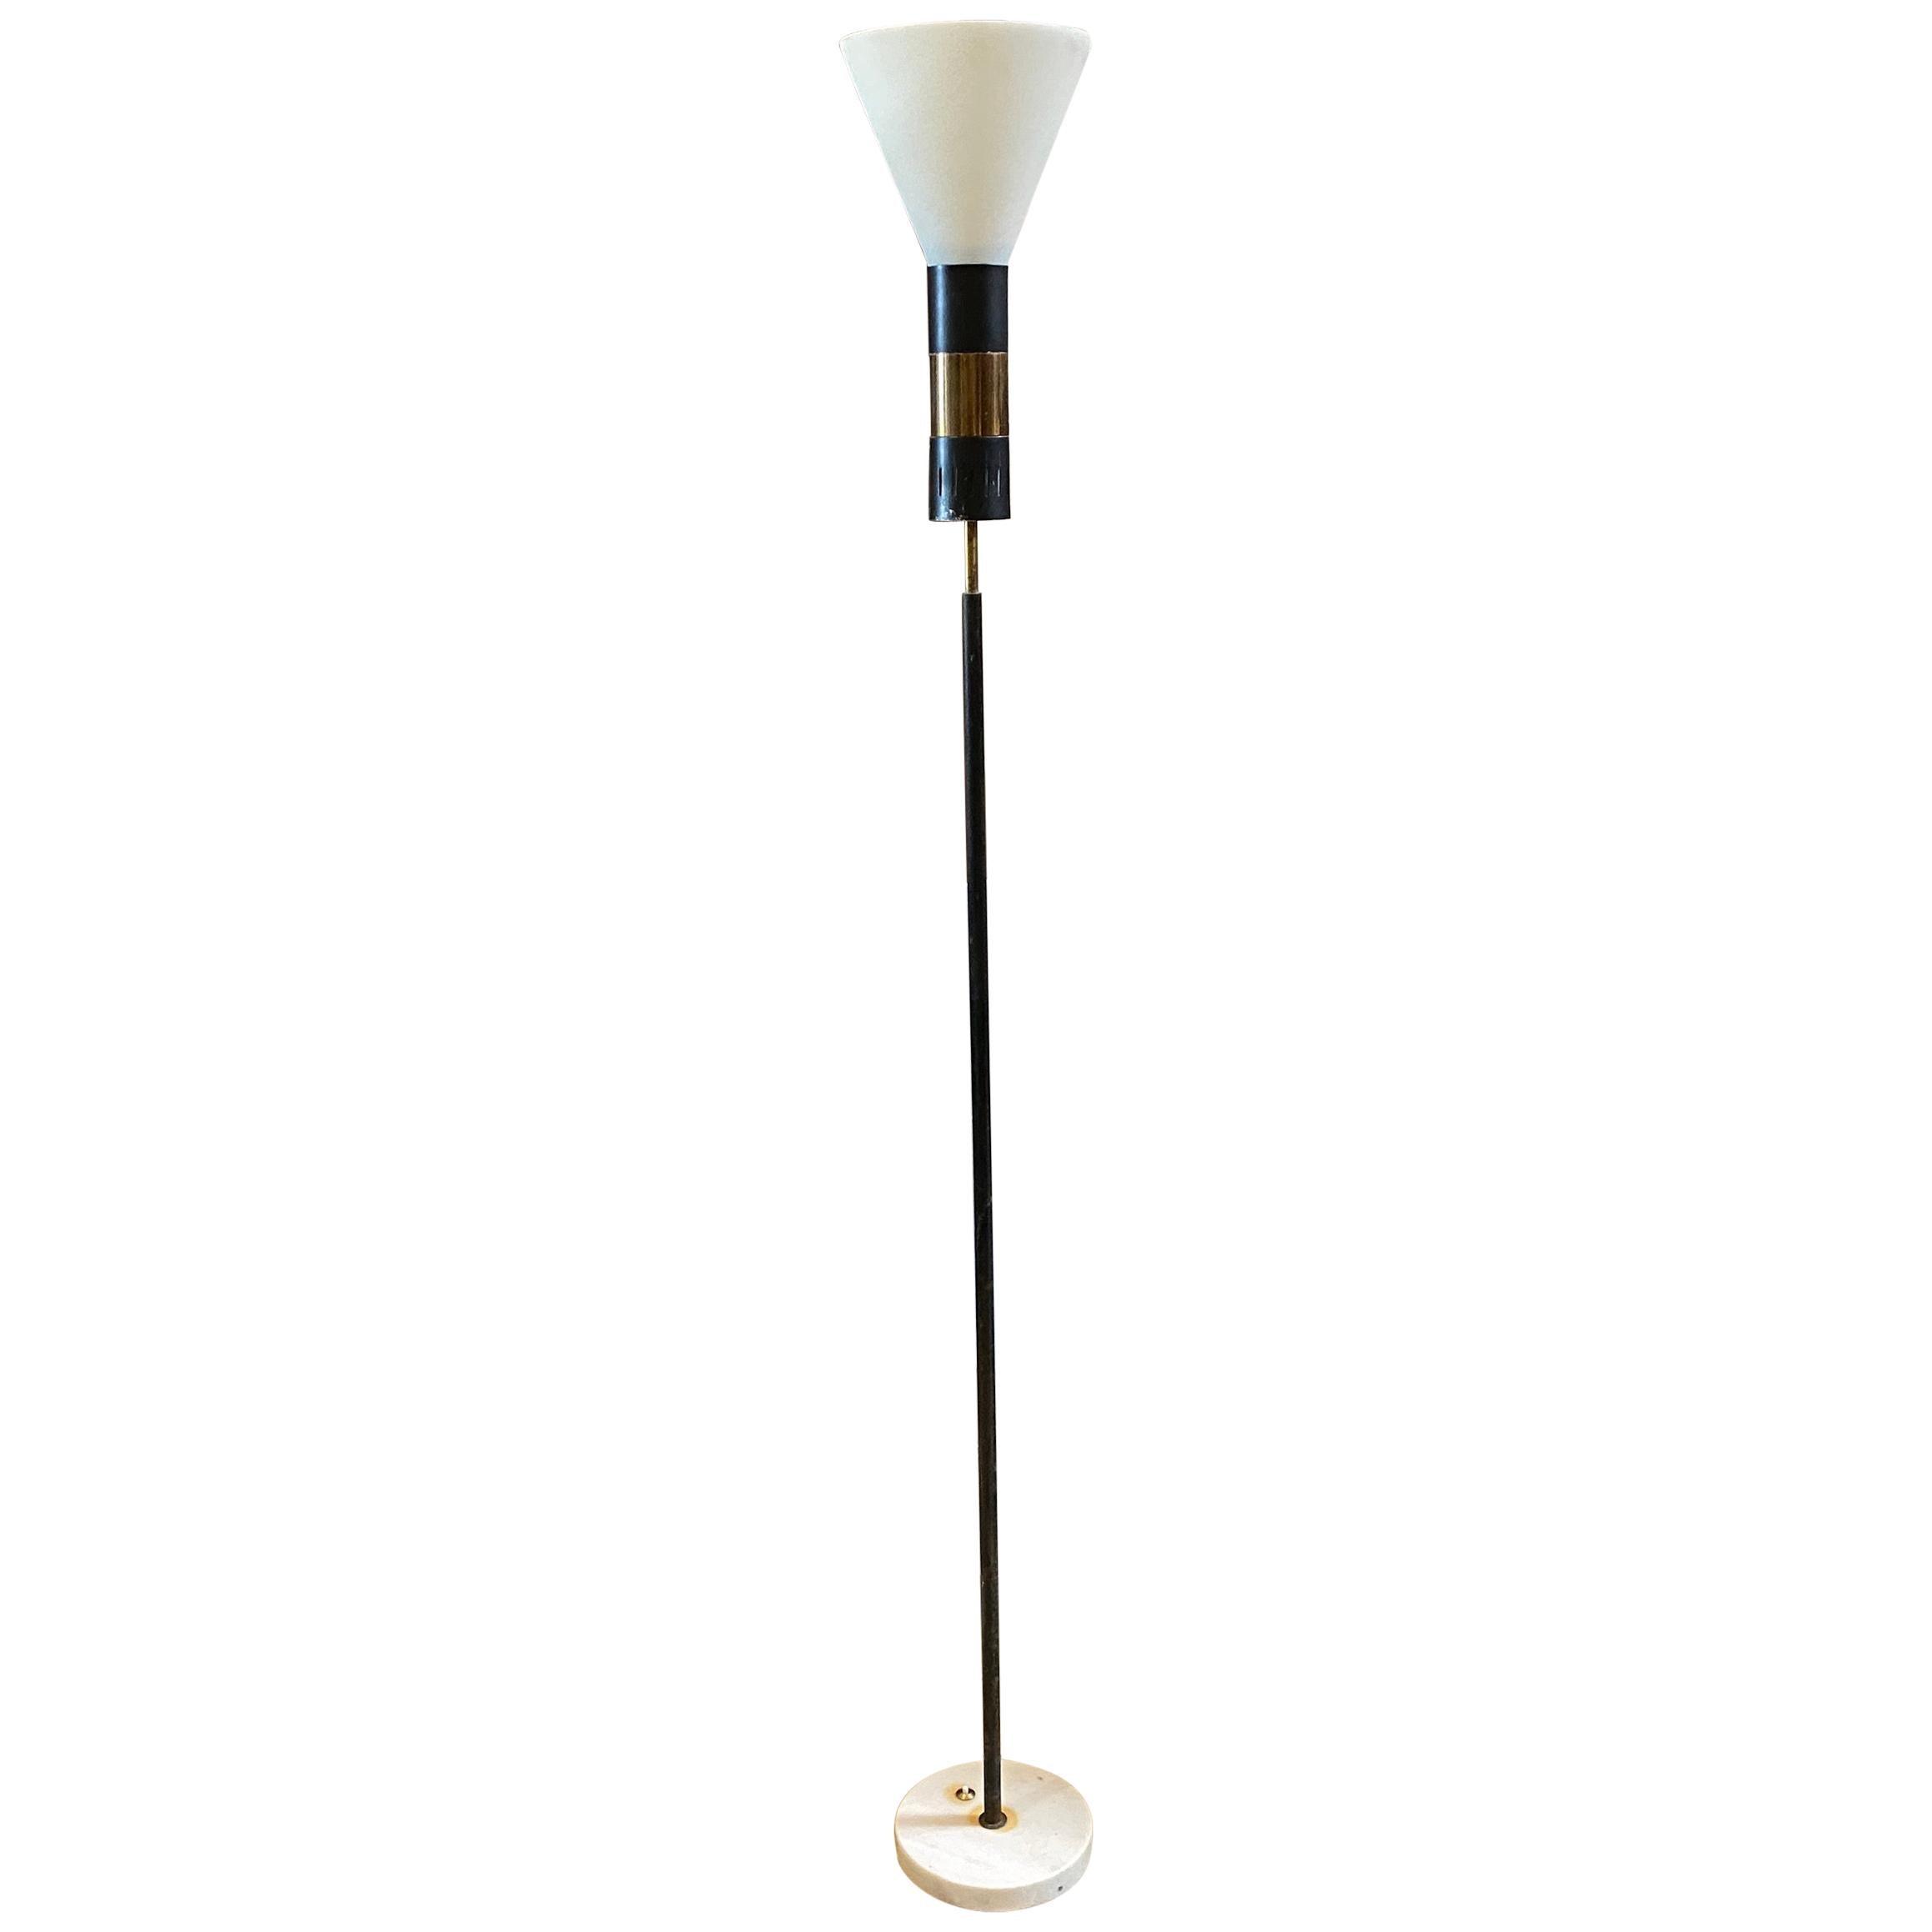 1950s Stilnovo Mid-Century Modern Floor Lamp